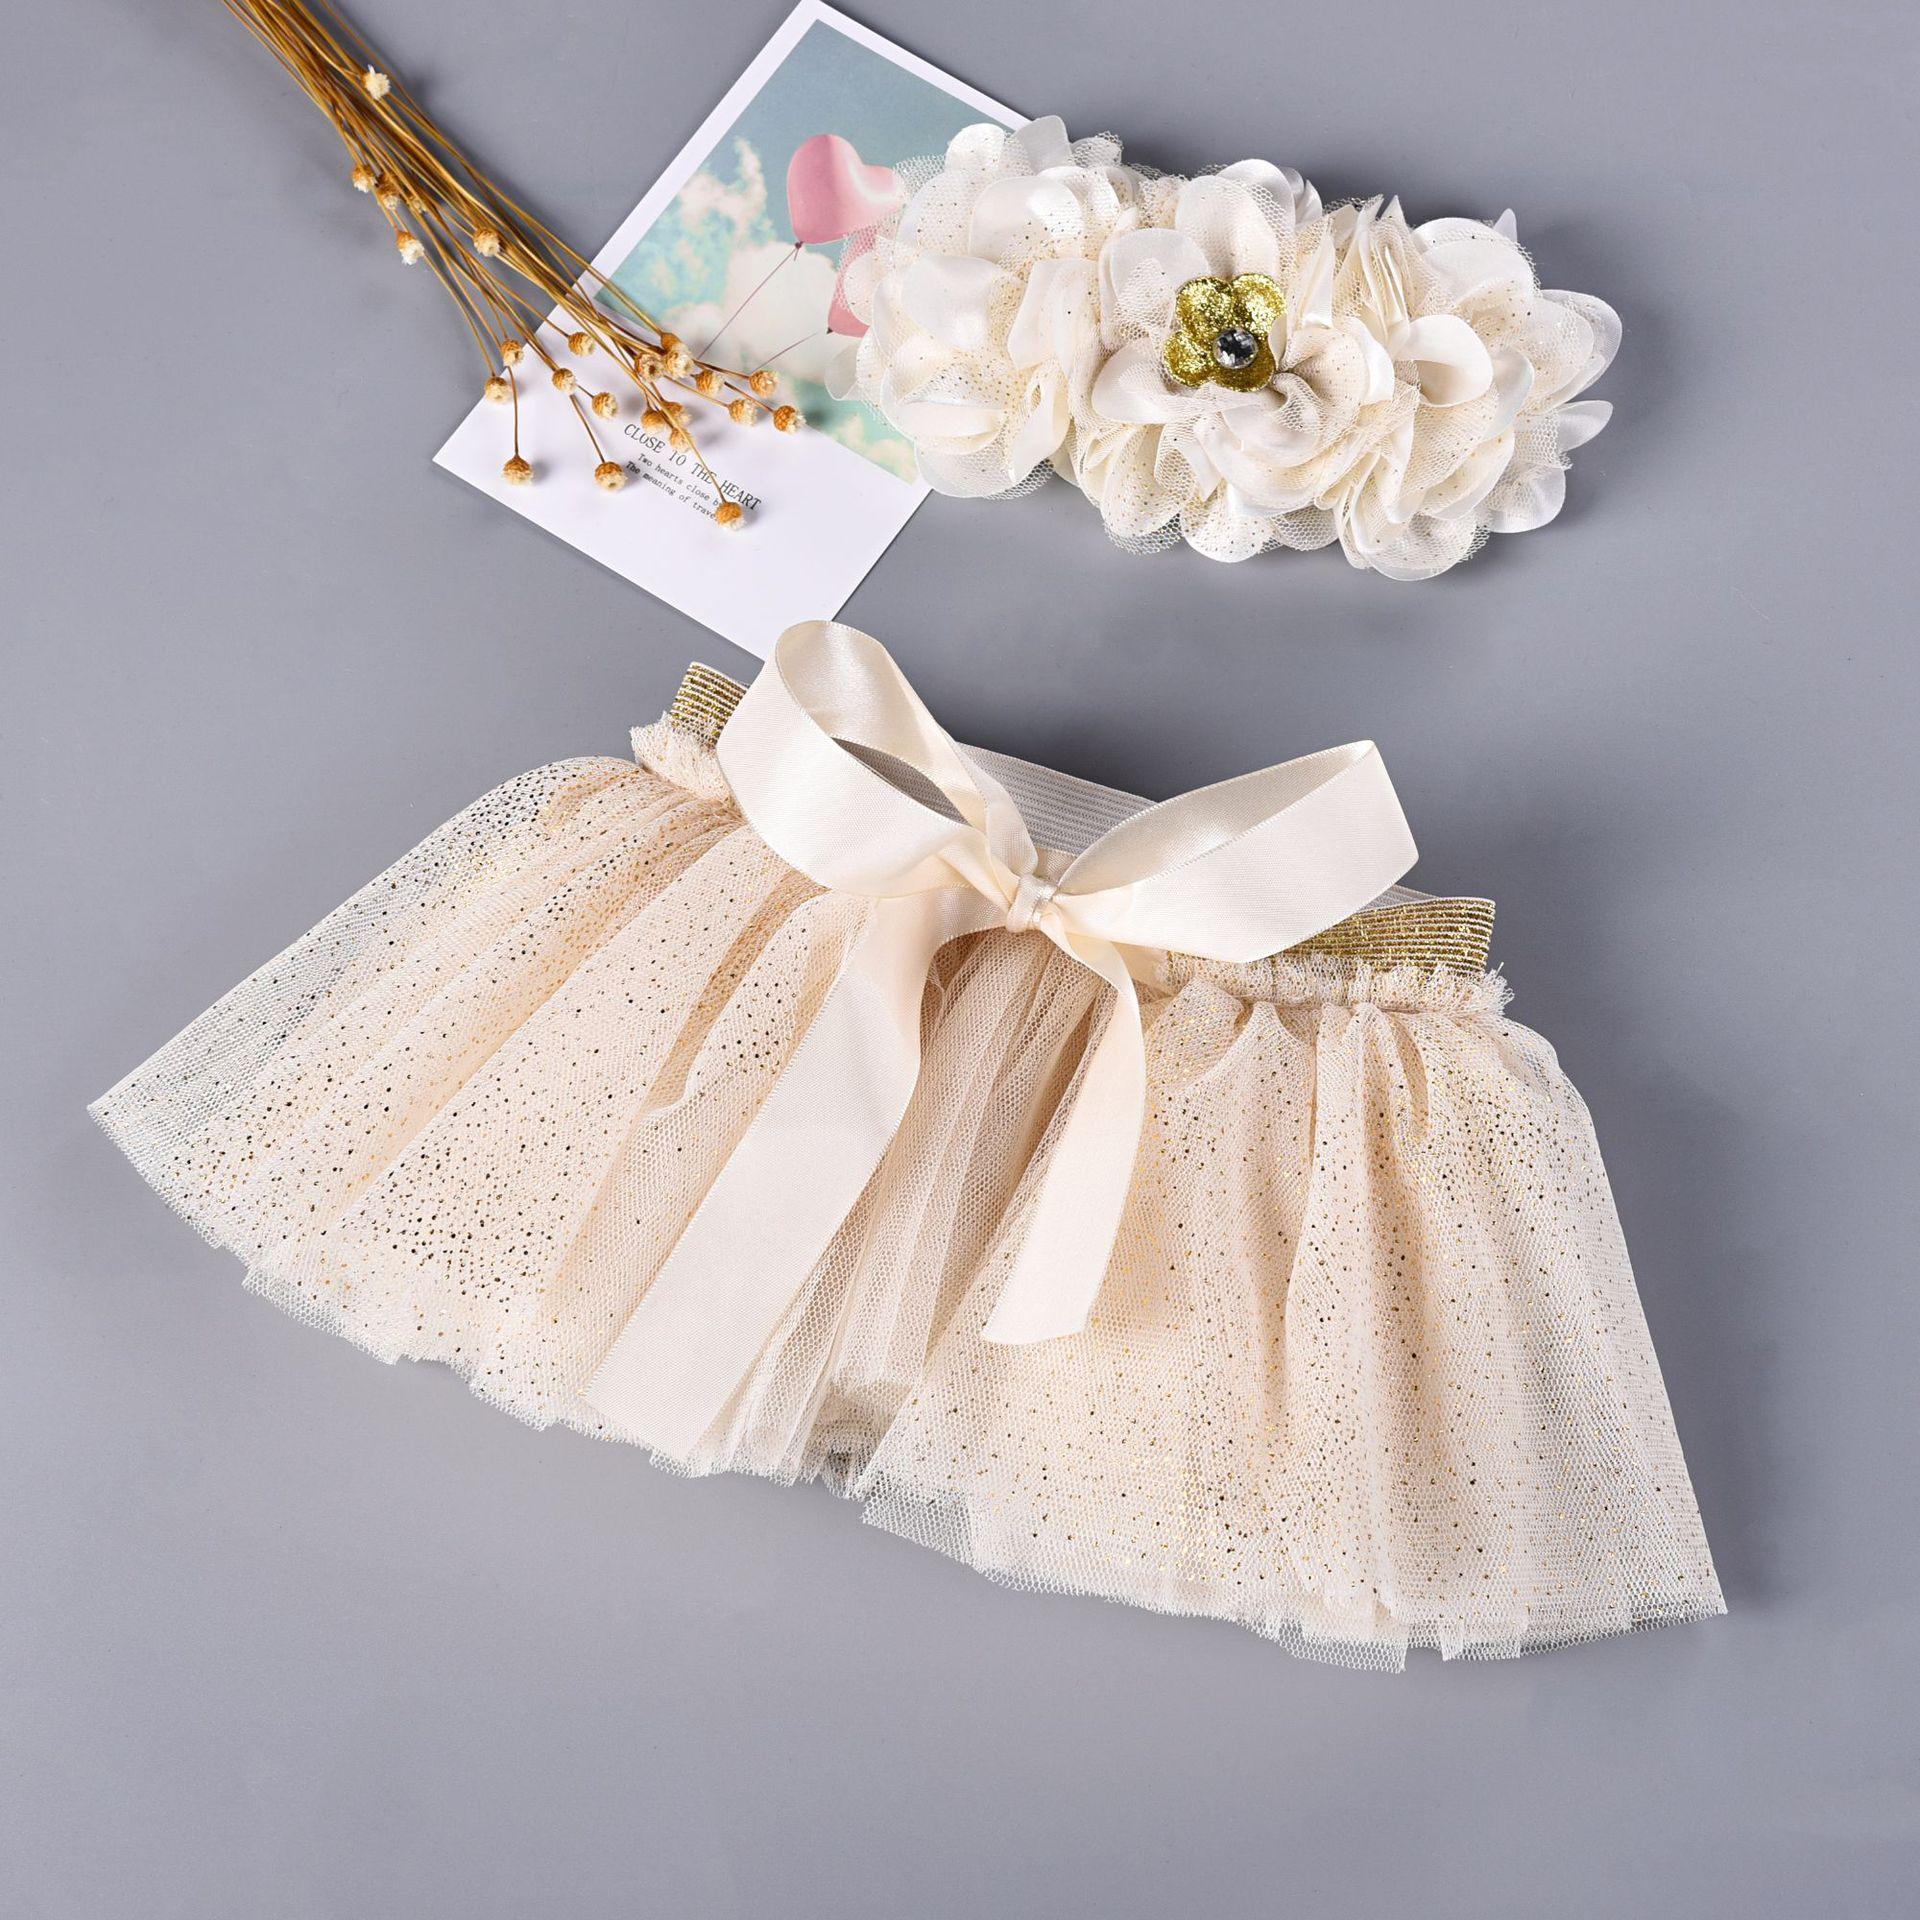 Baby Newborn Photograpghy Props Kids Children Baby White Tutu Skirt + Flower Hair Photos Props Newborn Photography Accessories